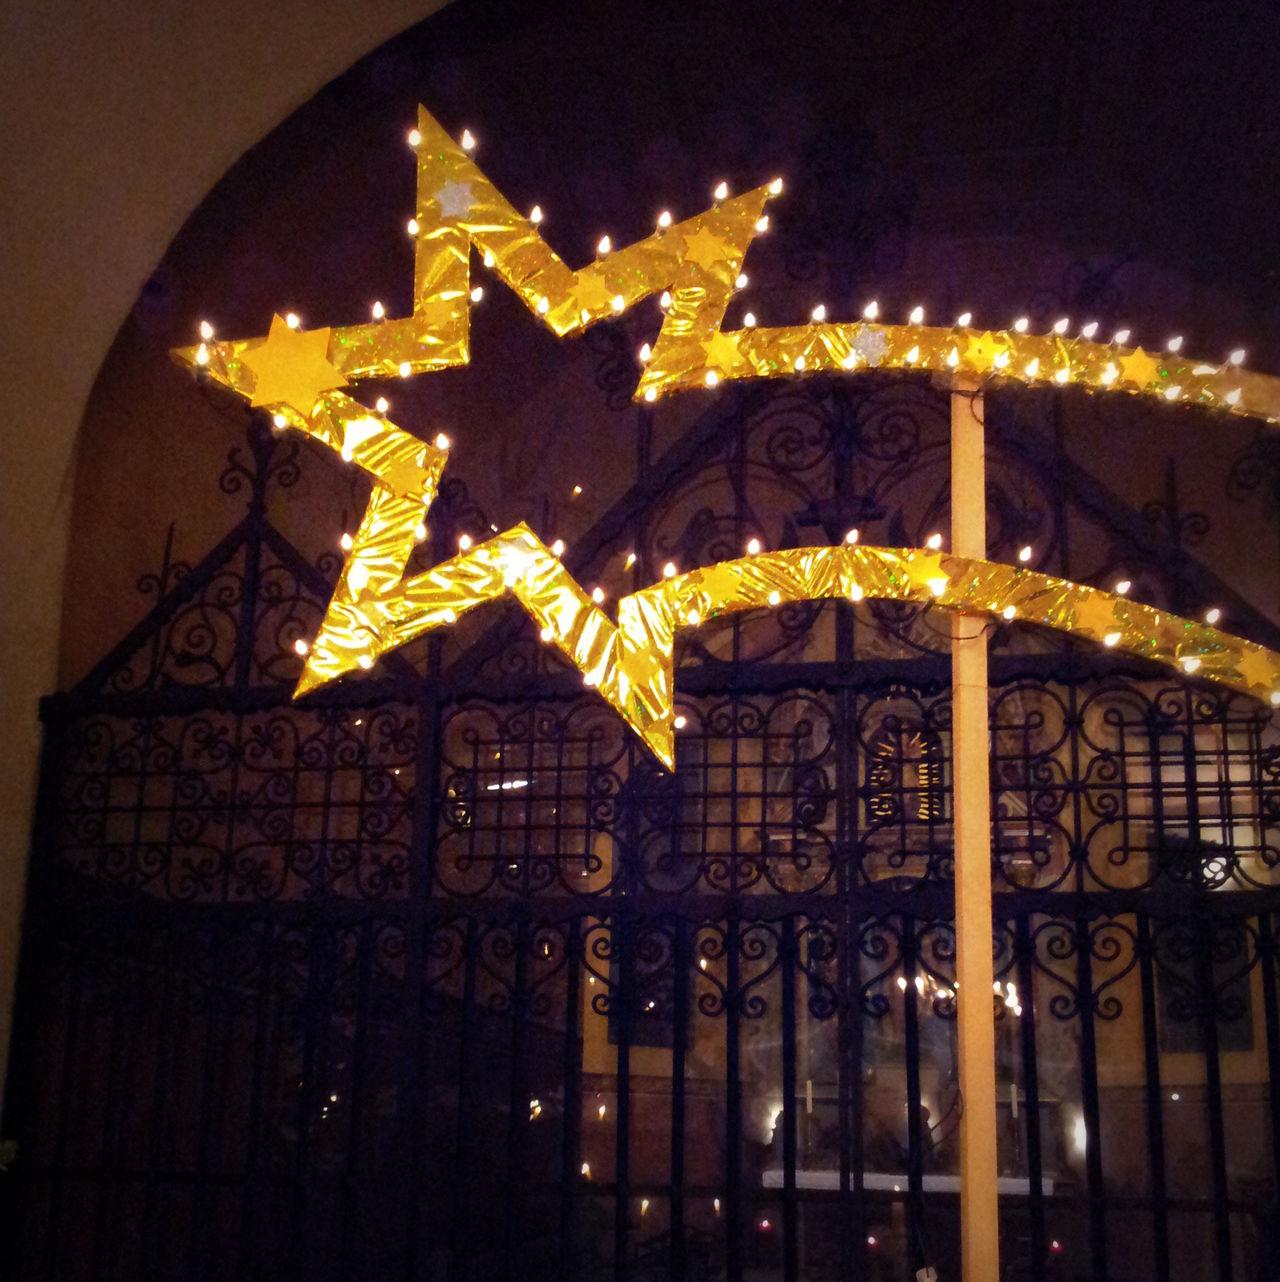 Architecture Art Christmas Tree Crib Illuminated KRIPPE Night Ornate Place Of Worship Religion S Star Of Bethlehem Stern Weichnachtsstern